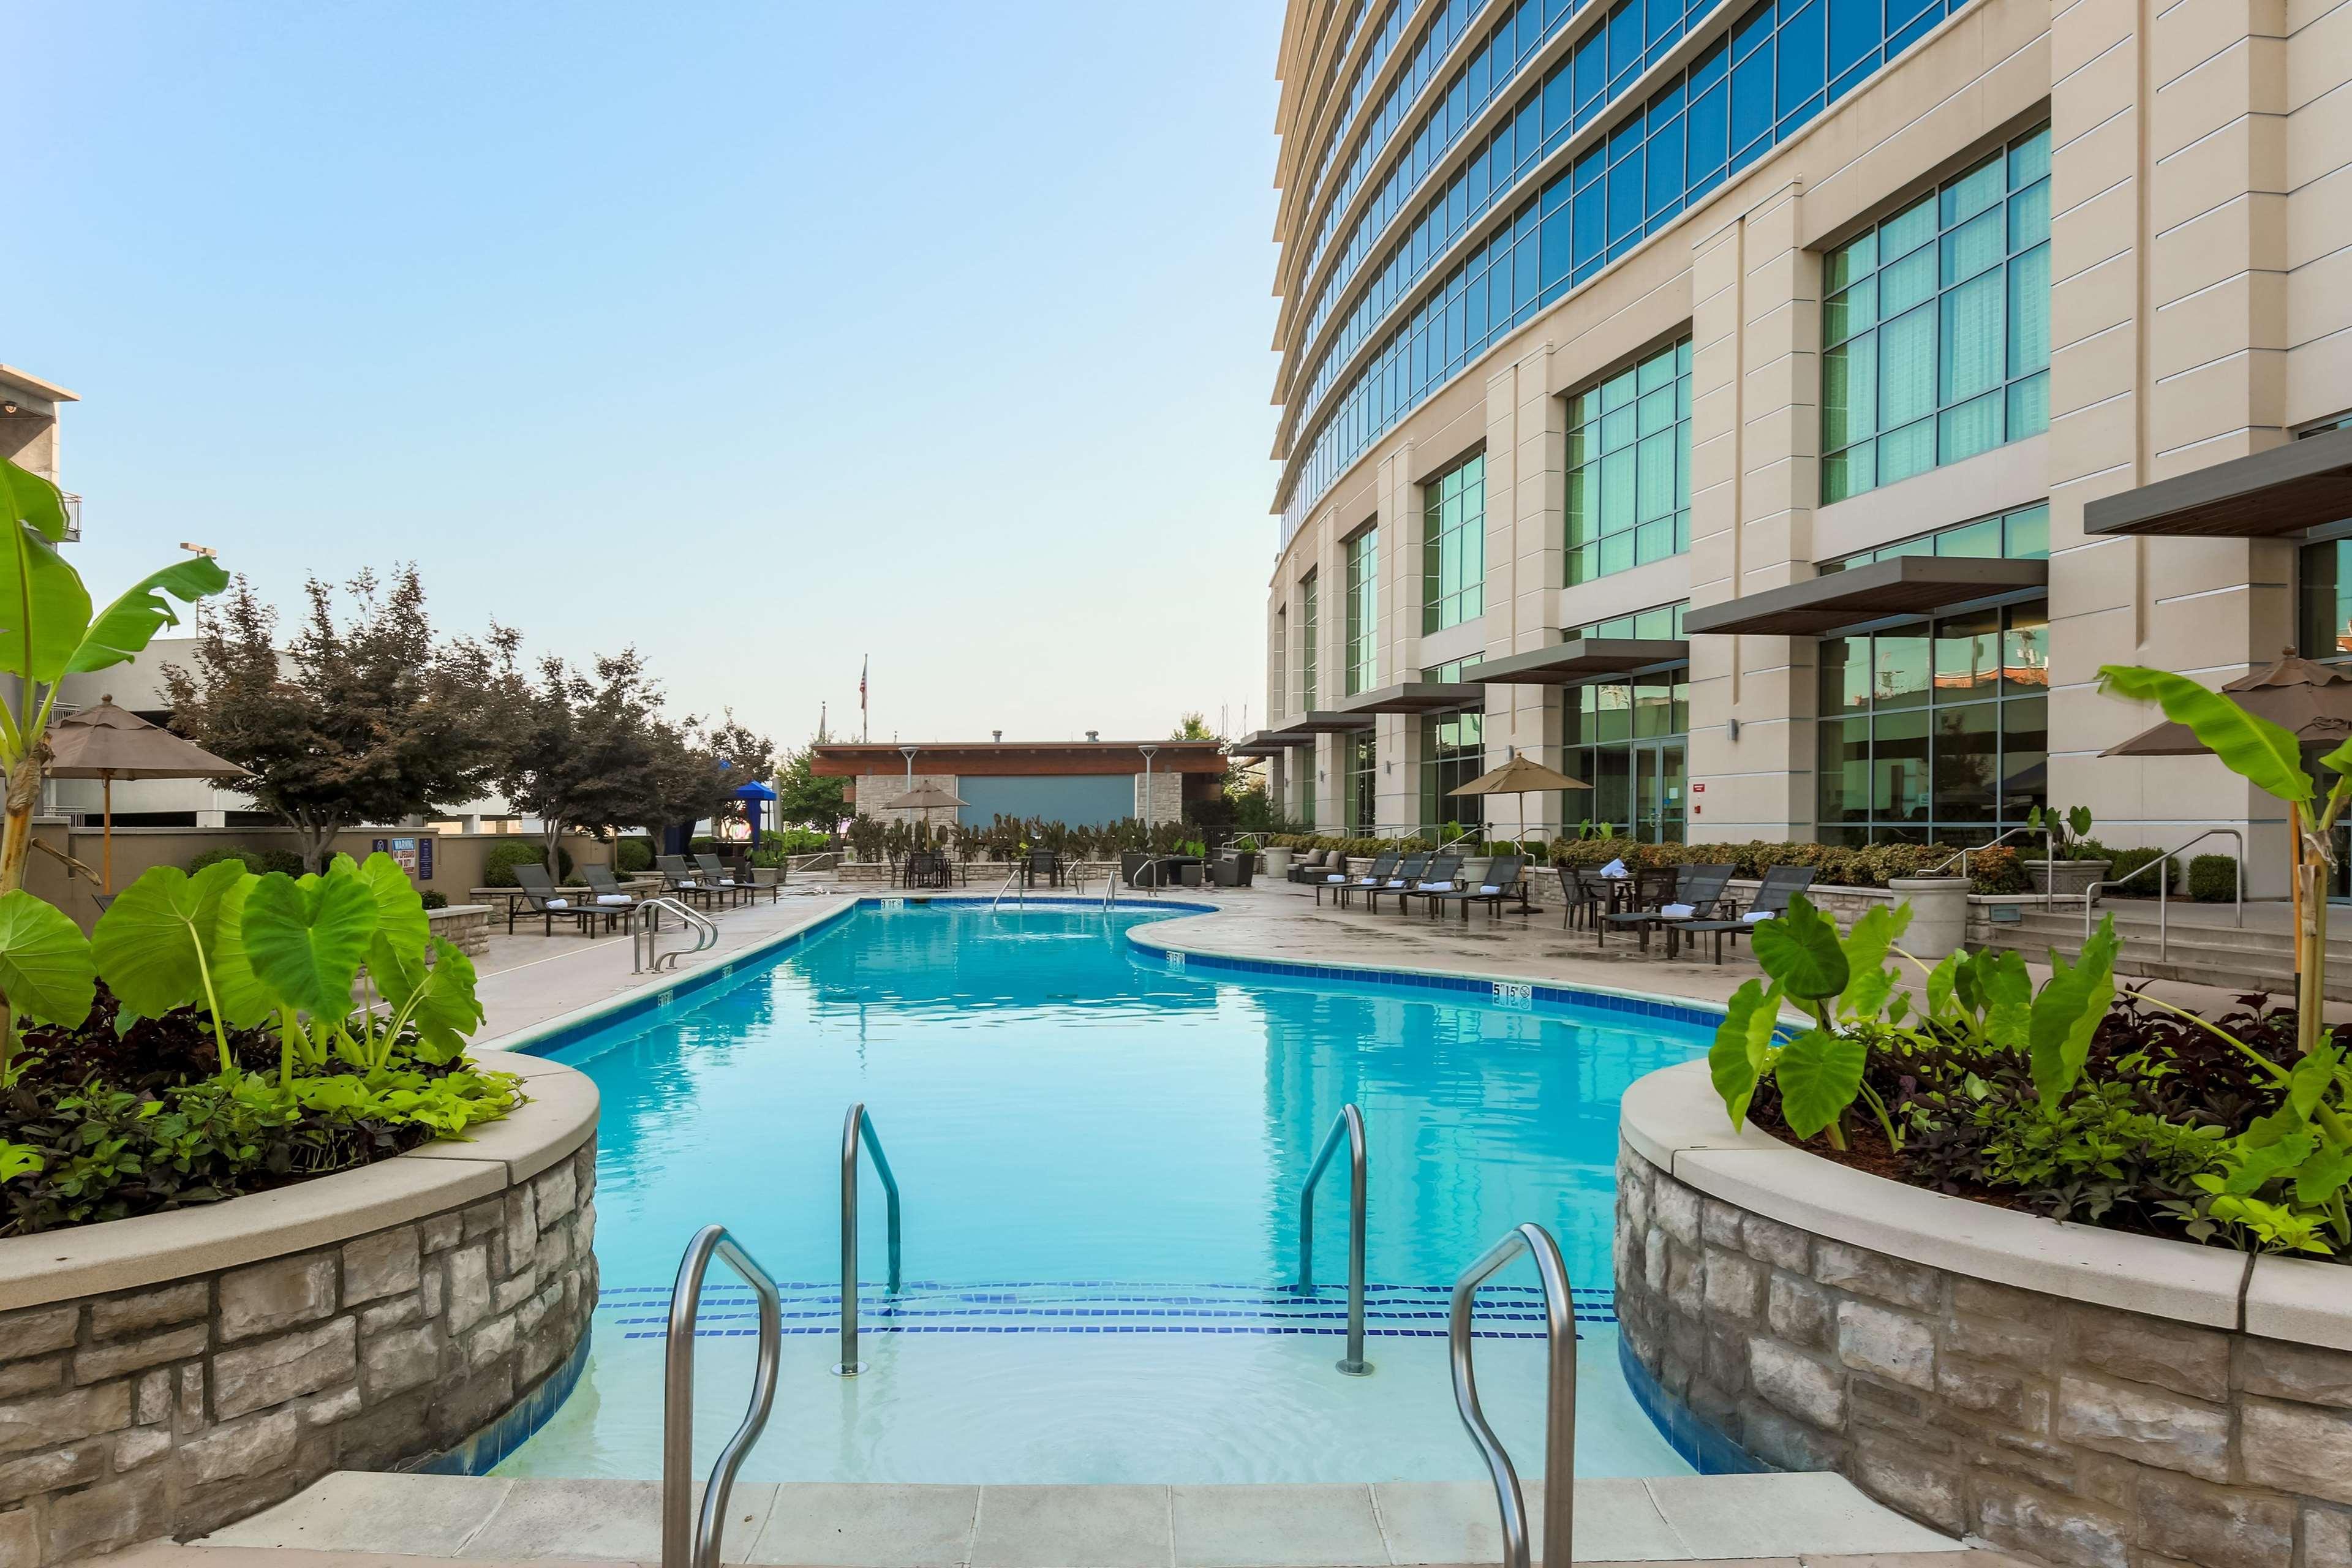 Hotels Near Branson Convention Center